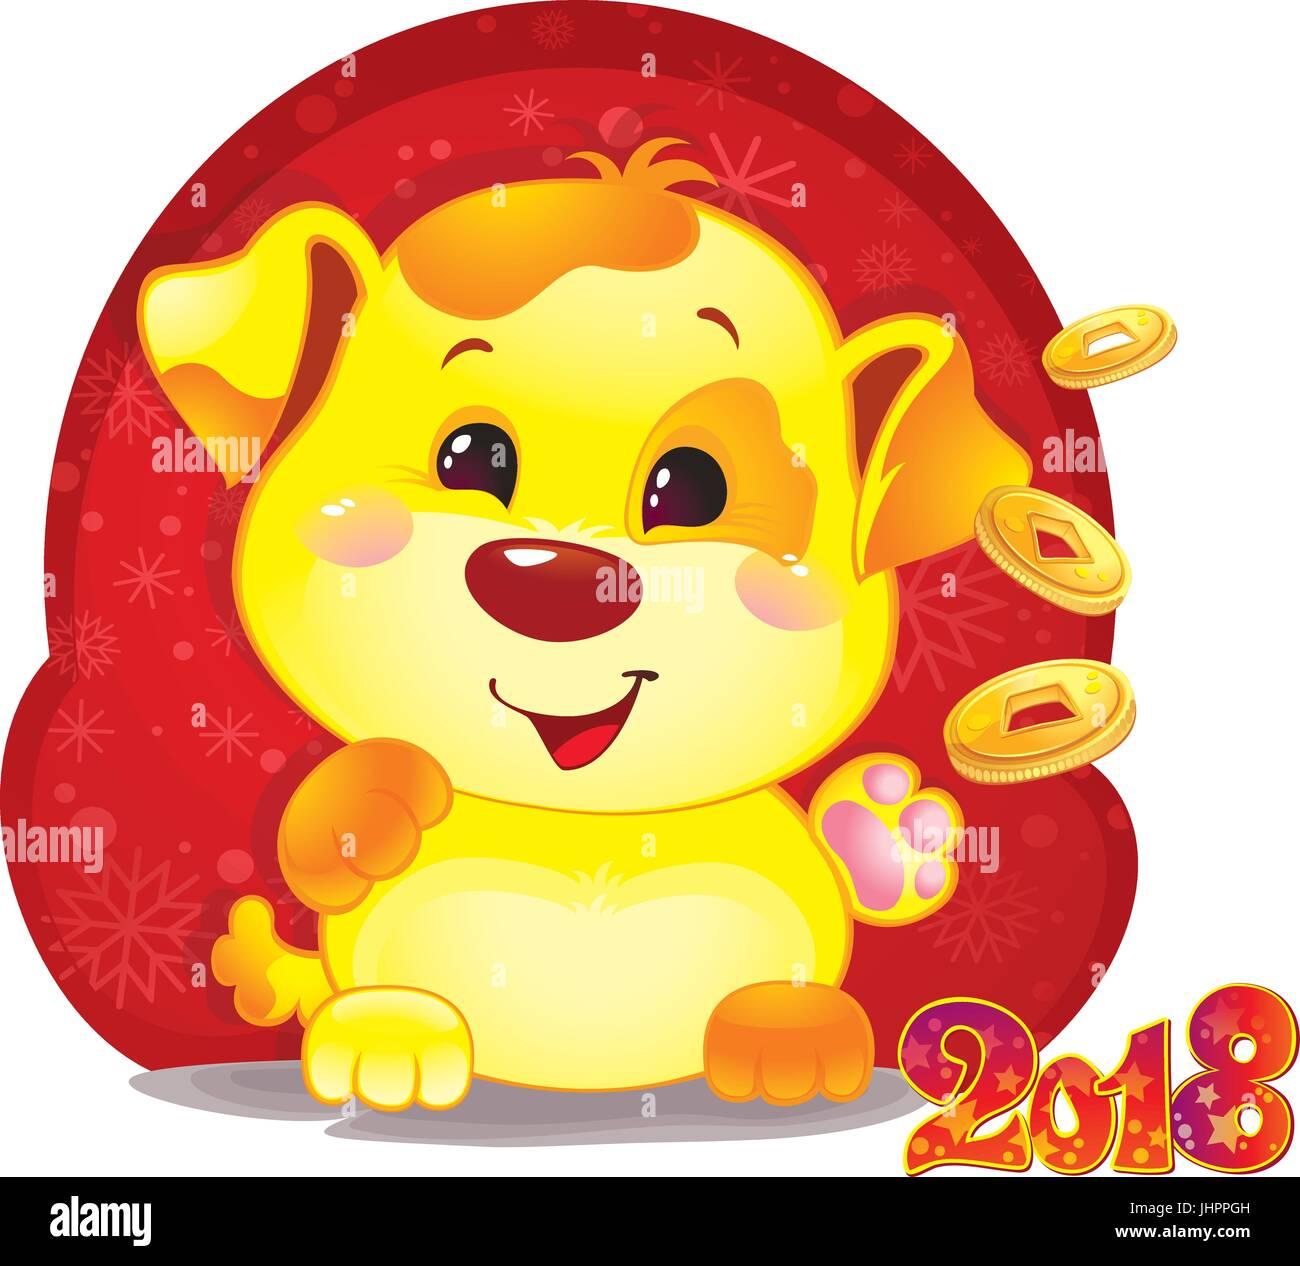 Cute symbol of chinese horoscope yellow dog with golden coins cute symbol of chinese horoscope yellow dog with golden coins for the new year 2018 biocorpaavc